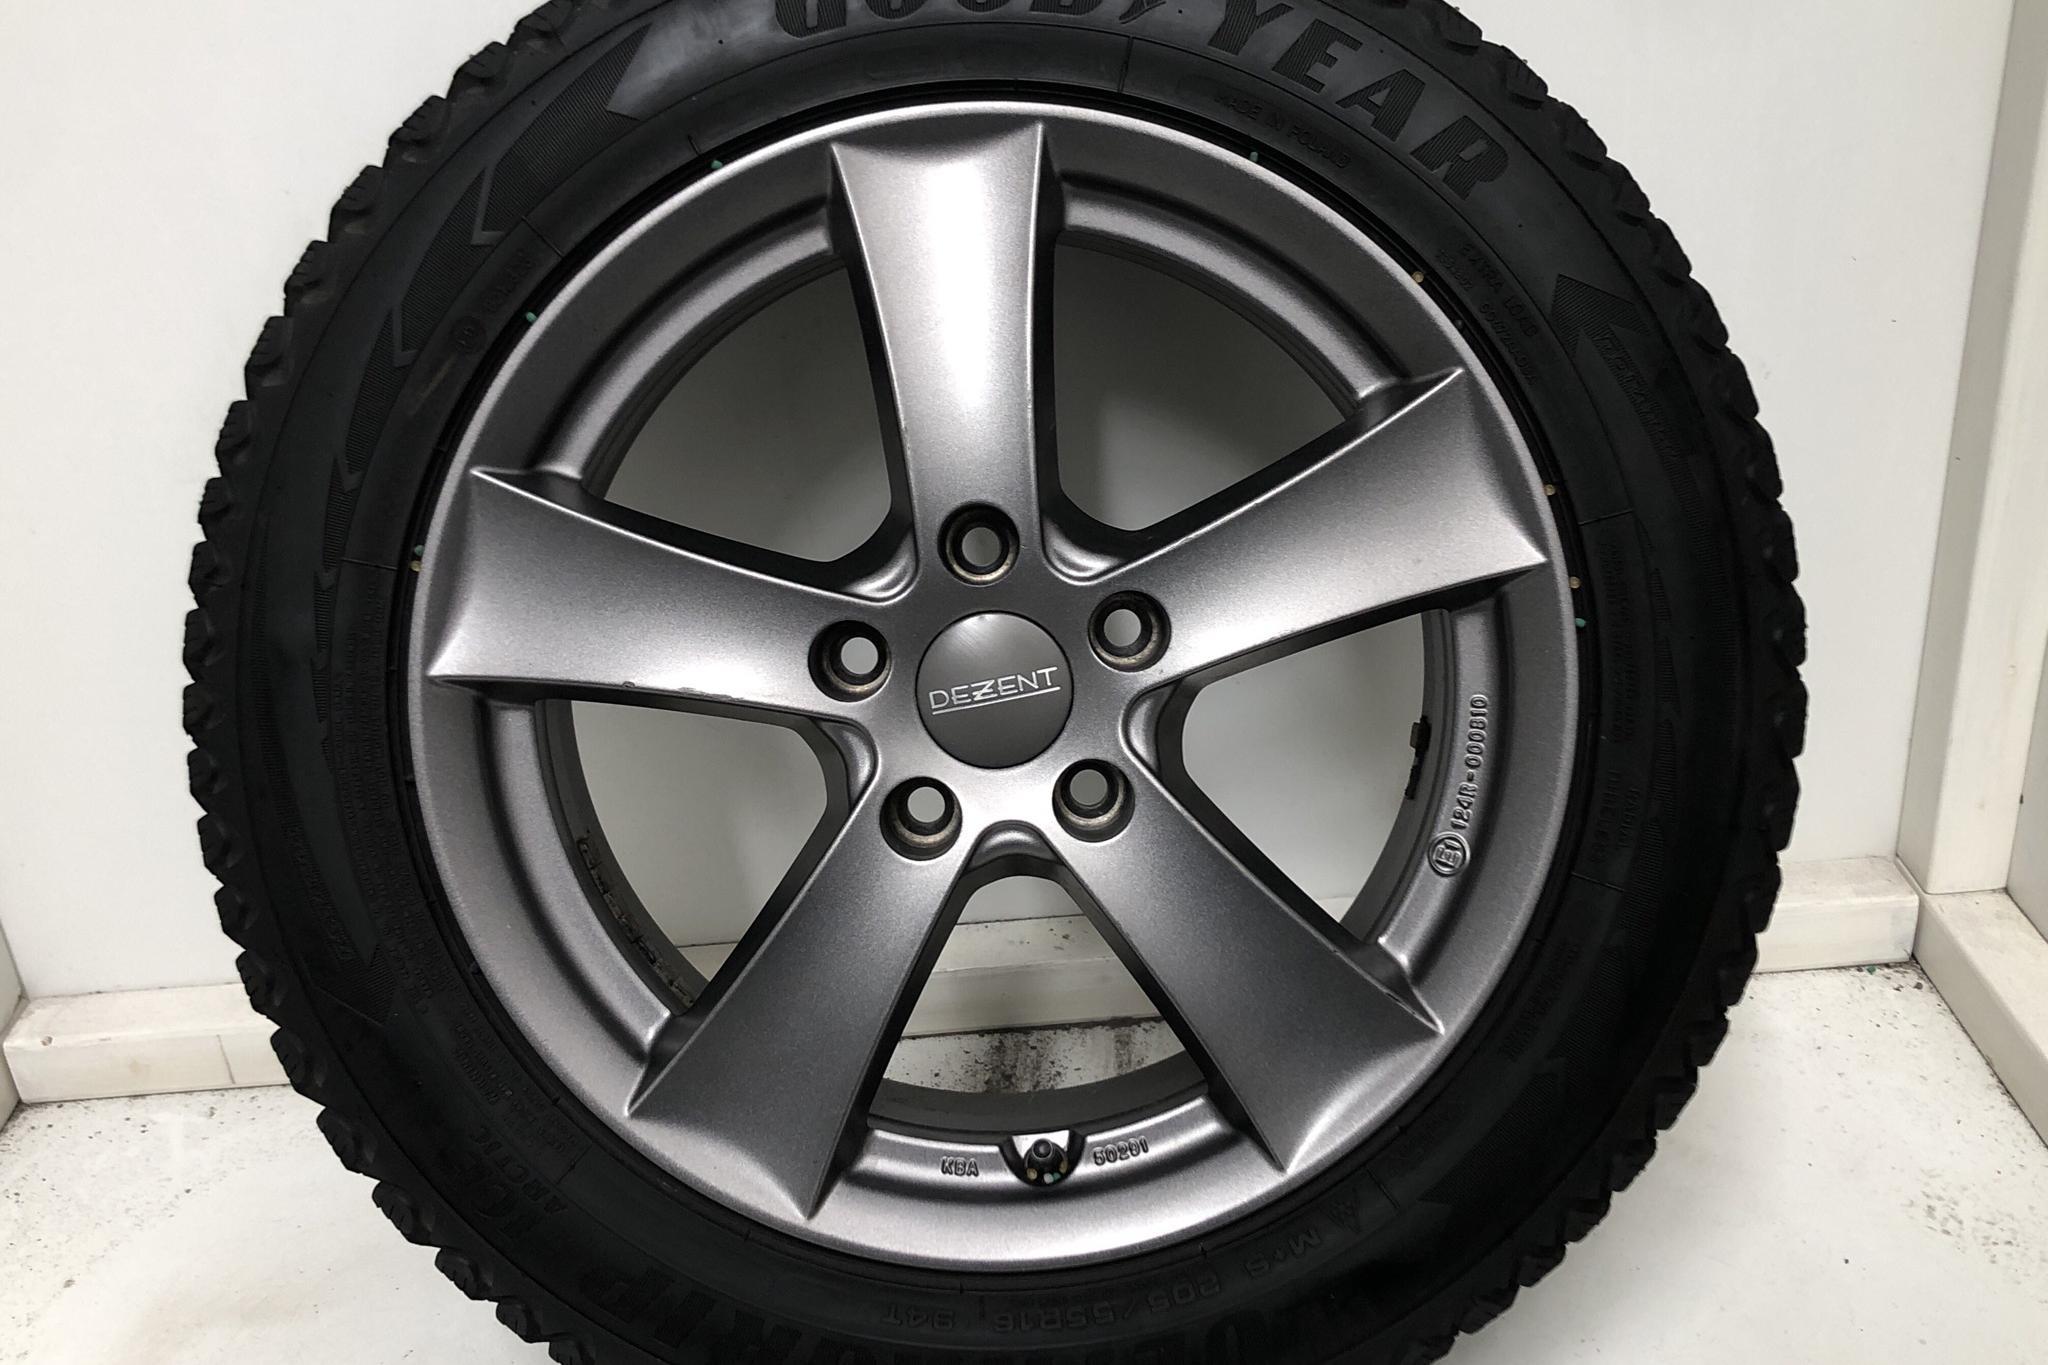 VW Golf VII GTE 5dr (204hk) - 3 895 mil - Automat - Dark Grey - 2018